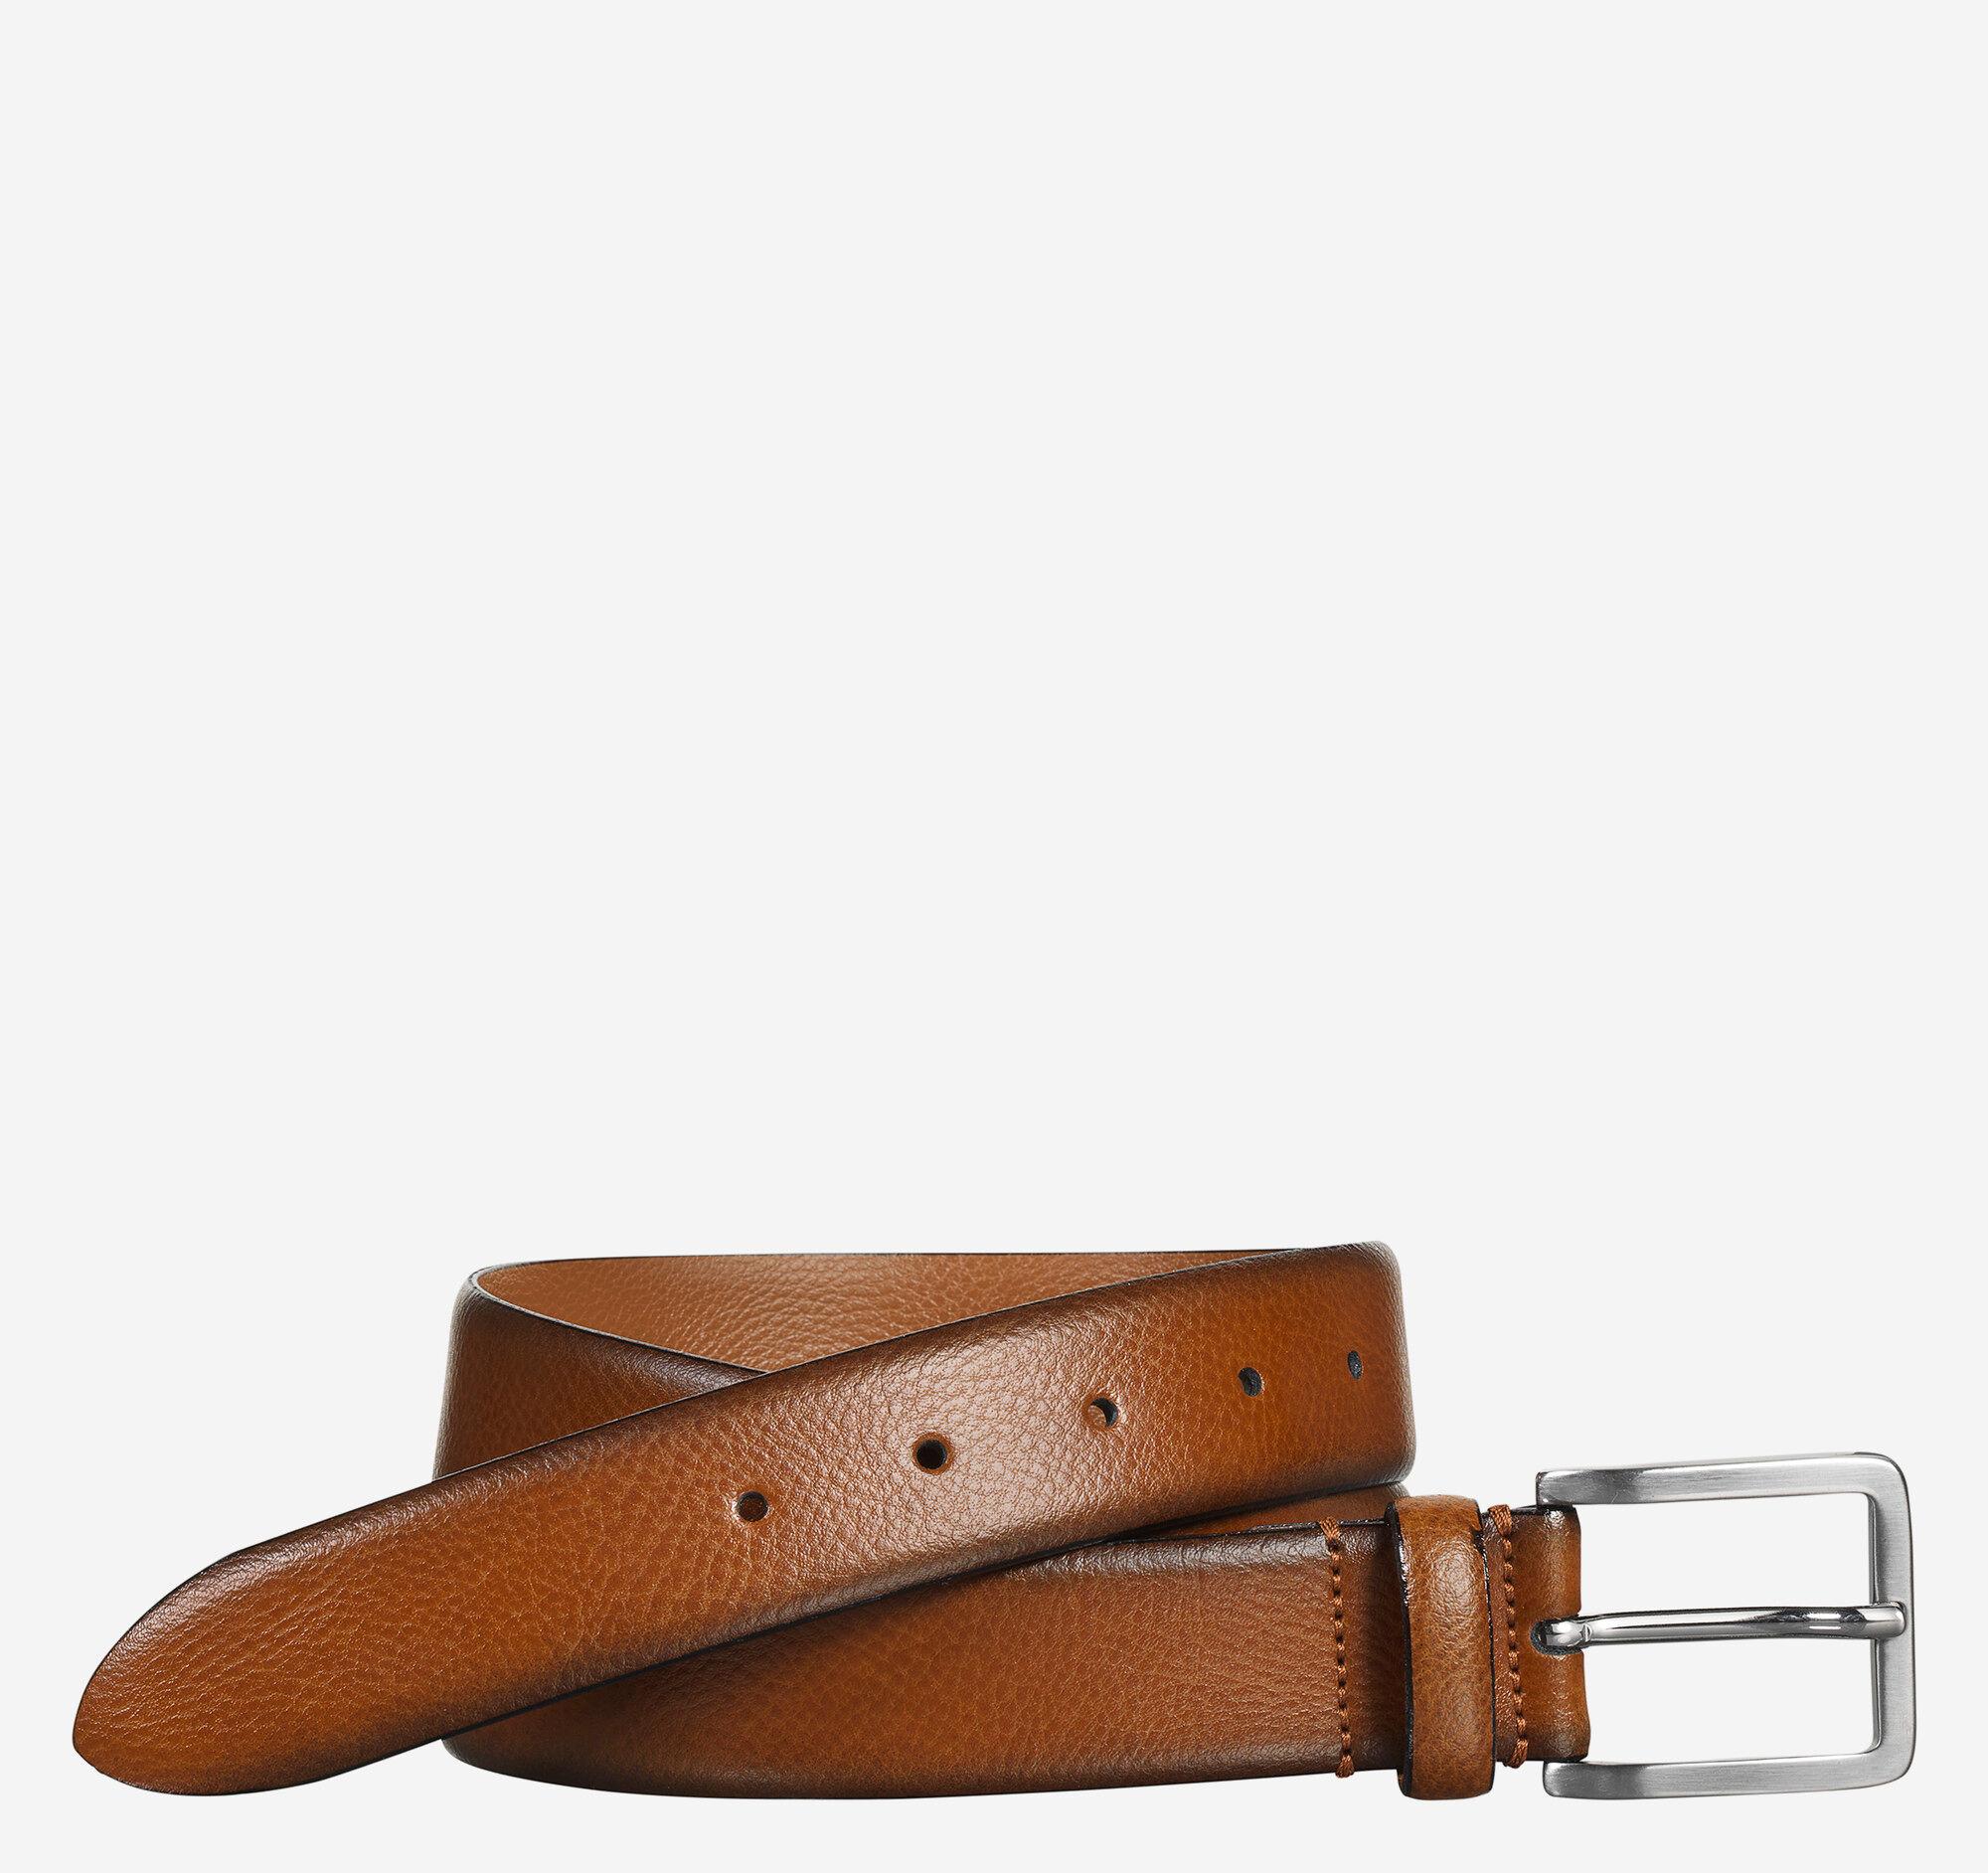 Johnston & Murphy Men's Feather-Edge Dress Belt - Tan - Size 40